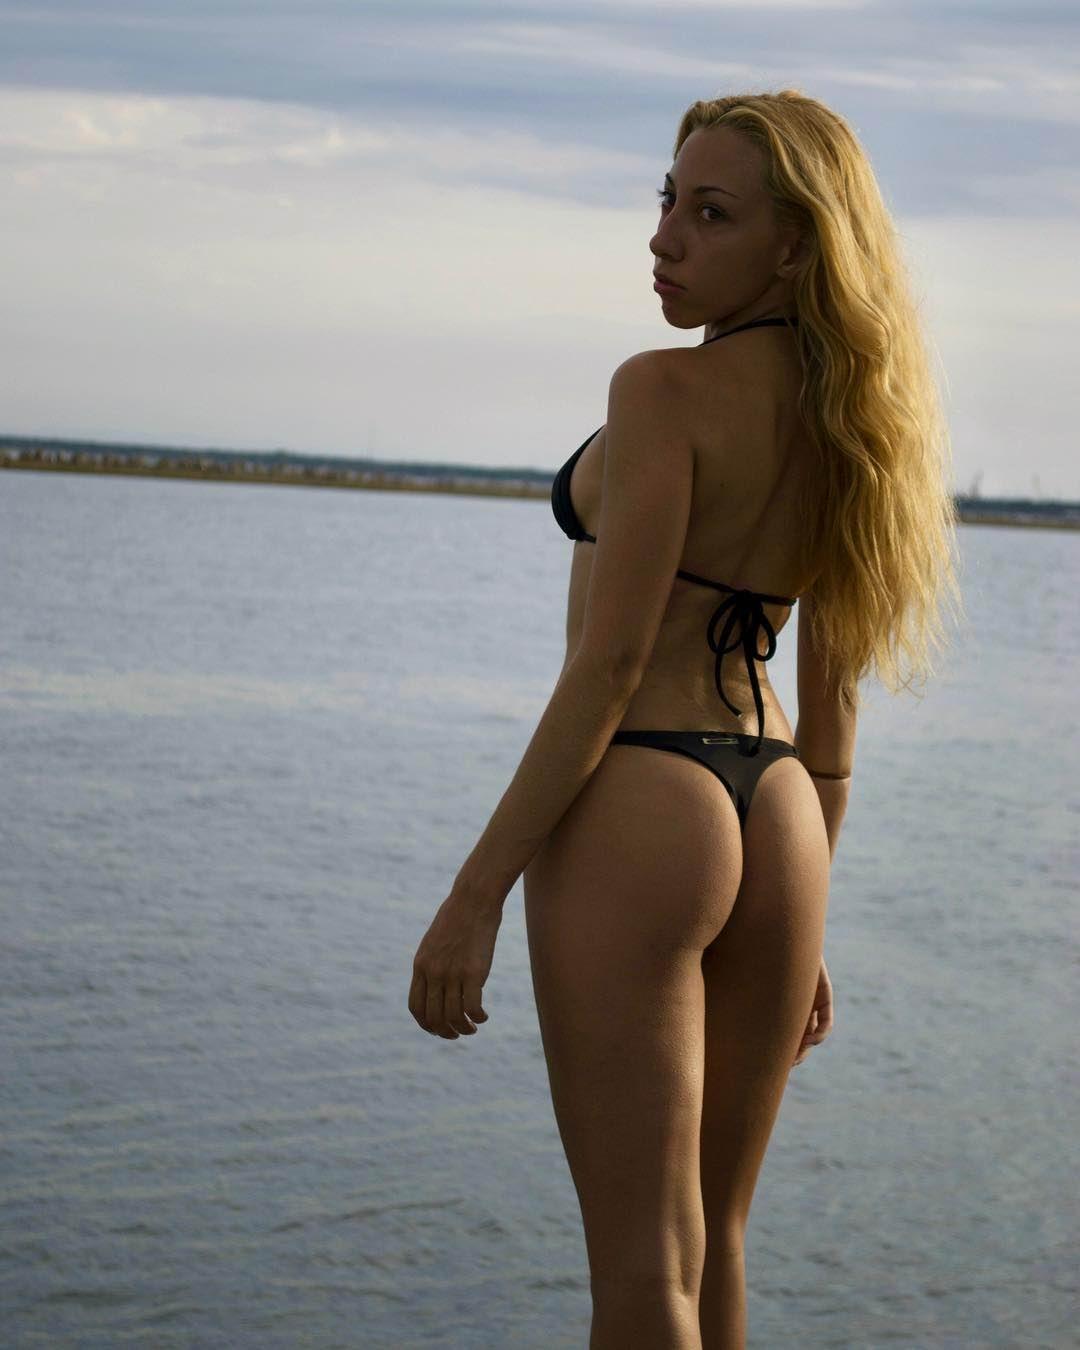 Model Abby